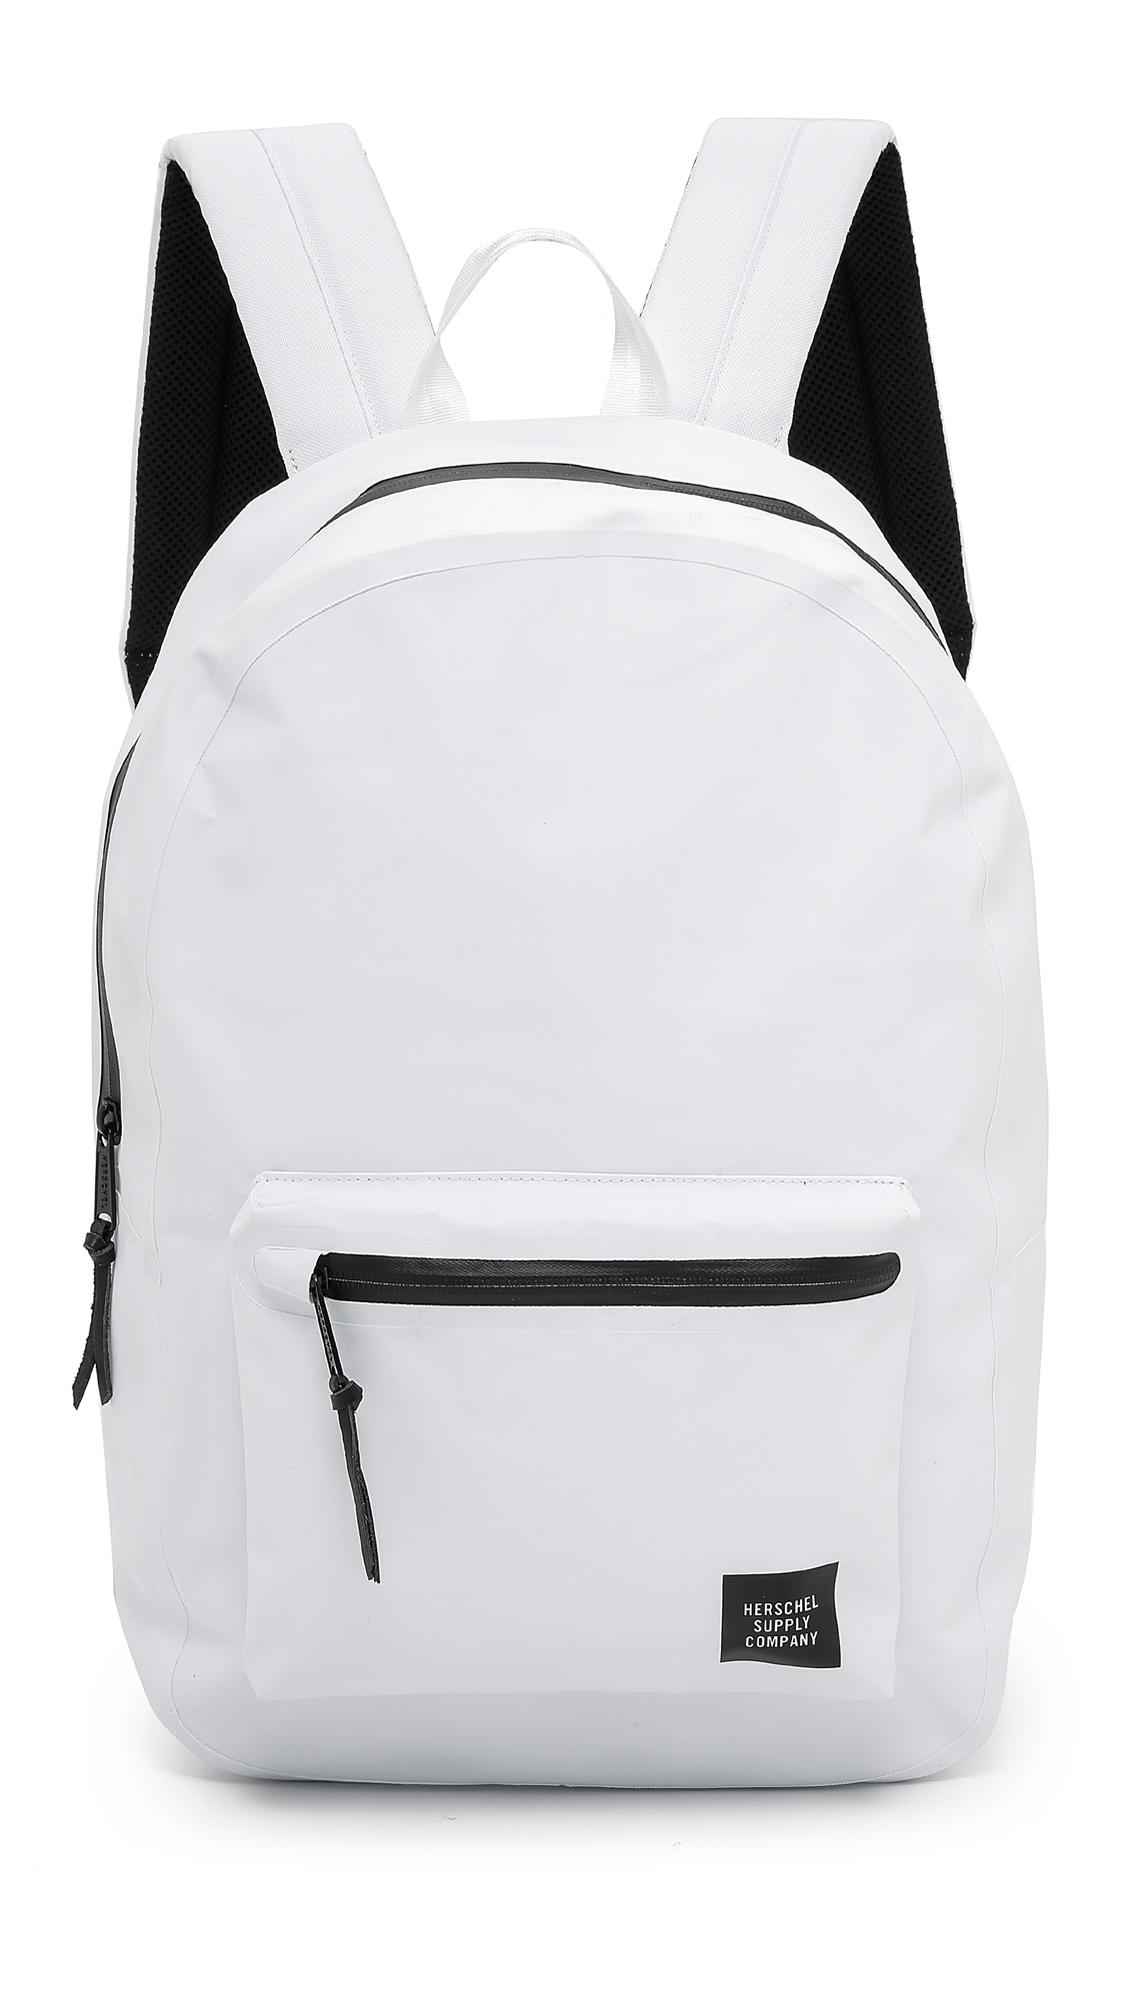 a7ffbe06fca0 Herschel Supply Co. Studio Settlement Backpack in White for Men - Lyst